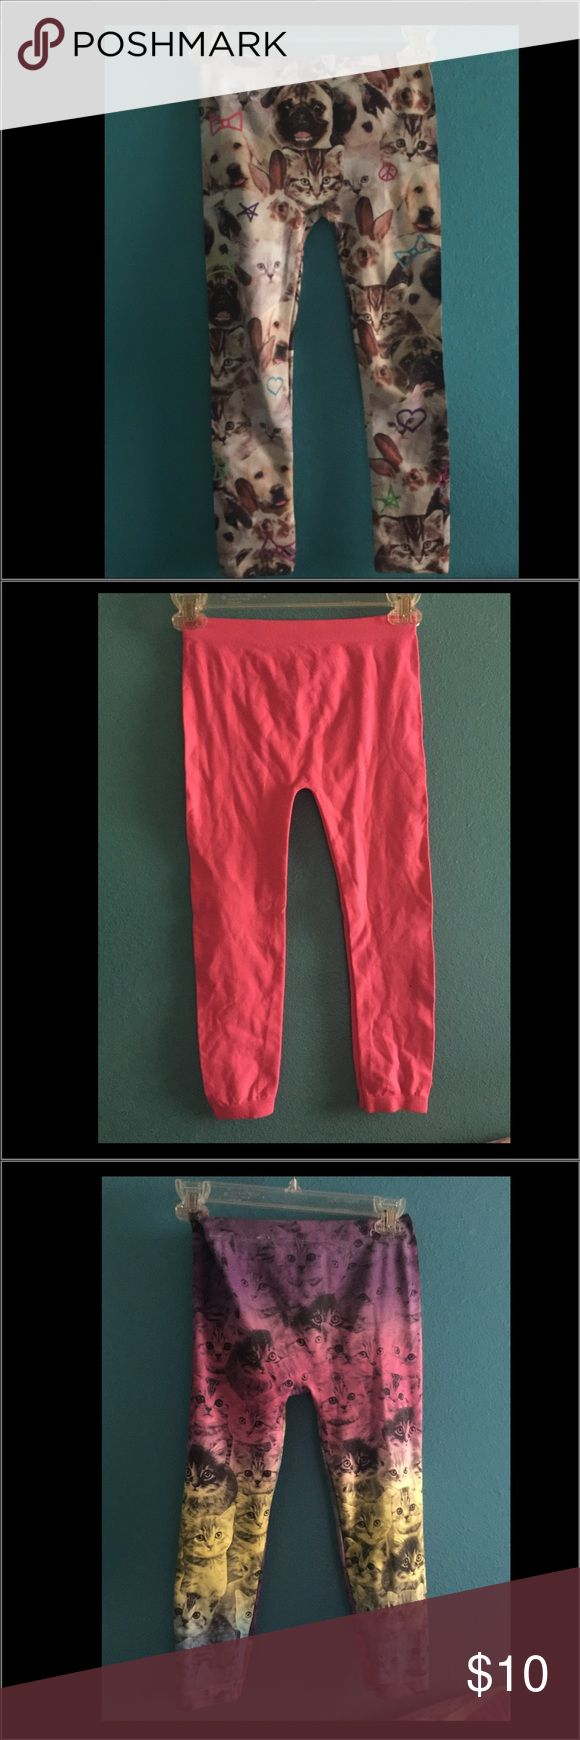 Leggings Cute, puppies, kittens and neon pink leggings. Pants Leggings